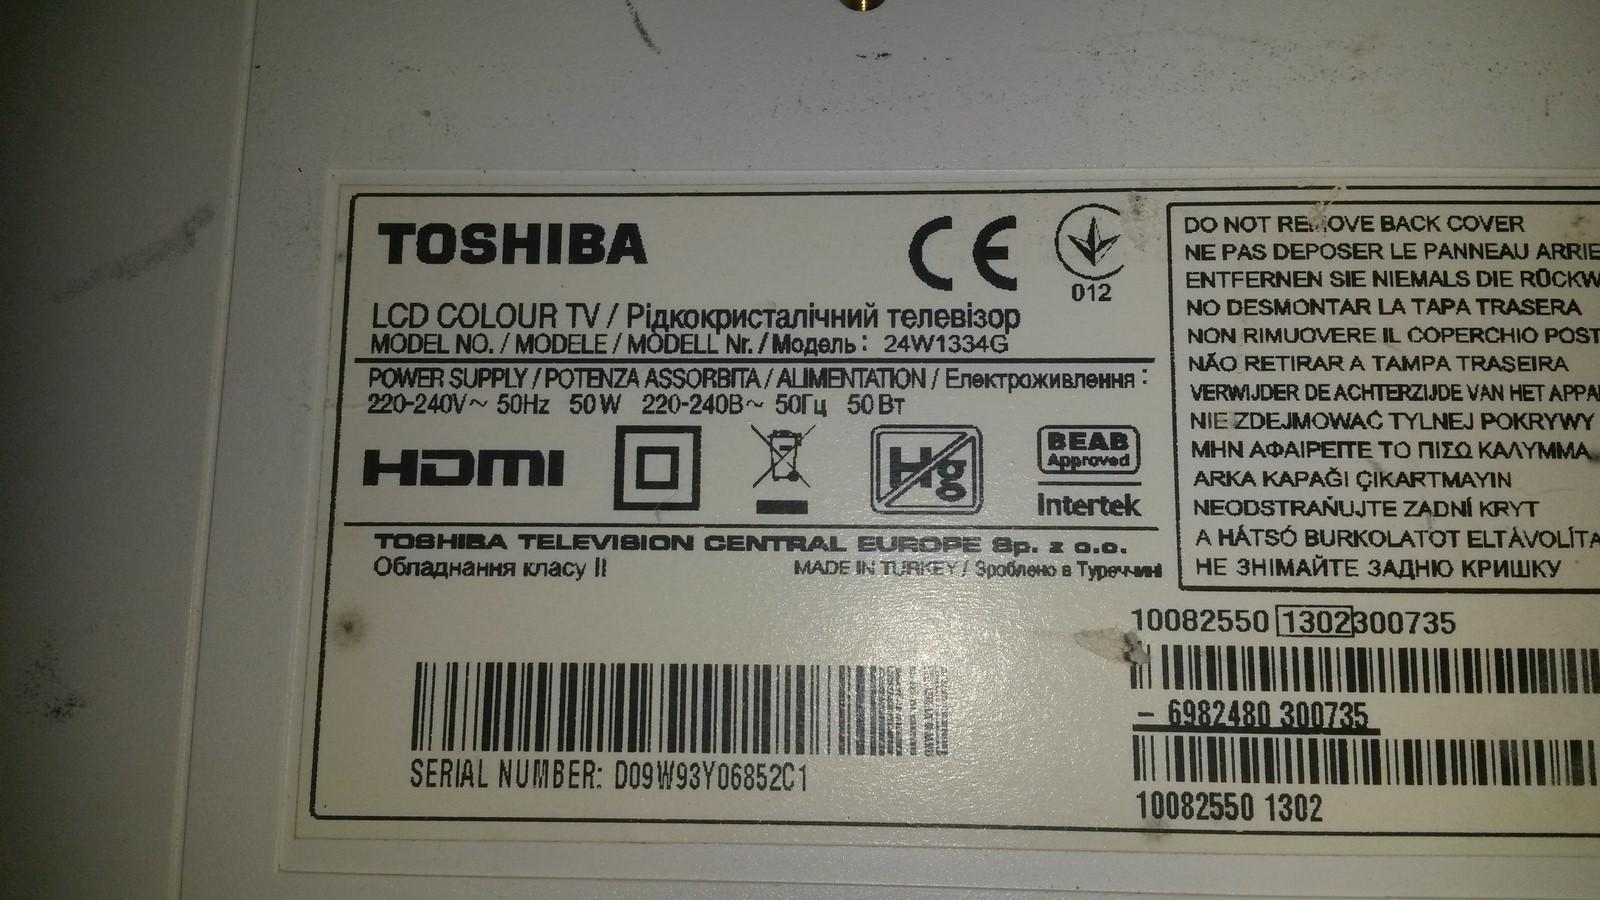 Vestel 17mb62 1 firmware